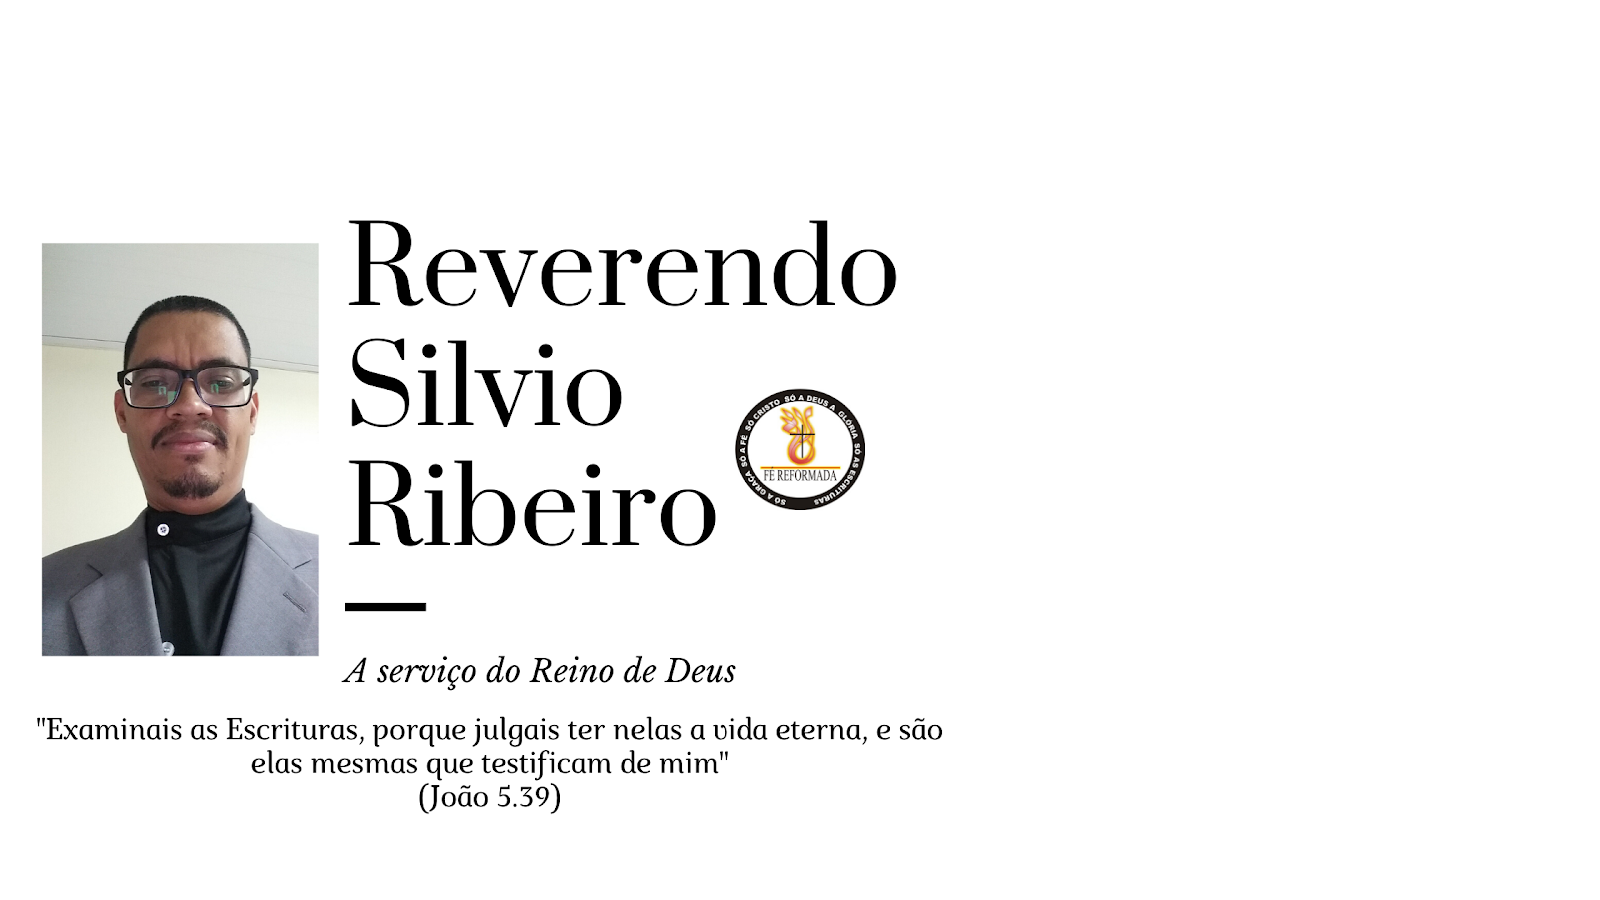 Reverendo Silvio Ribeiro